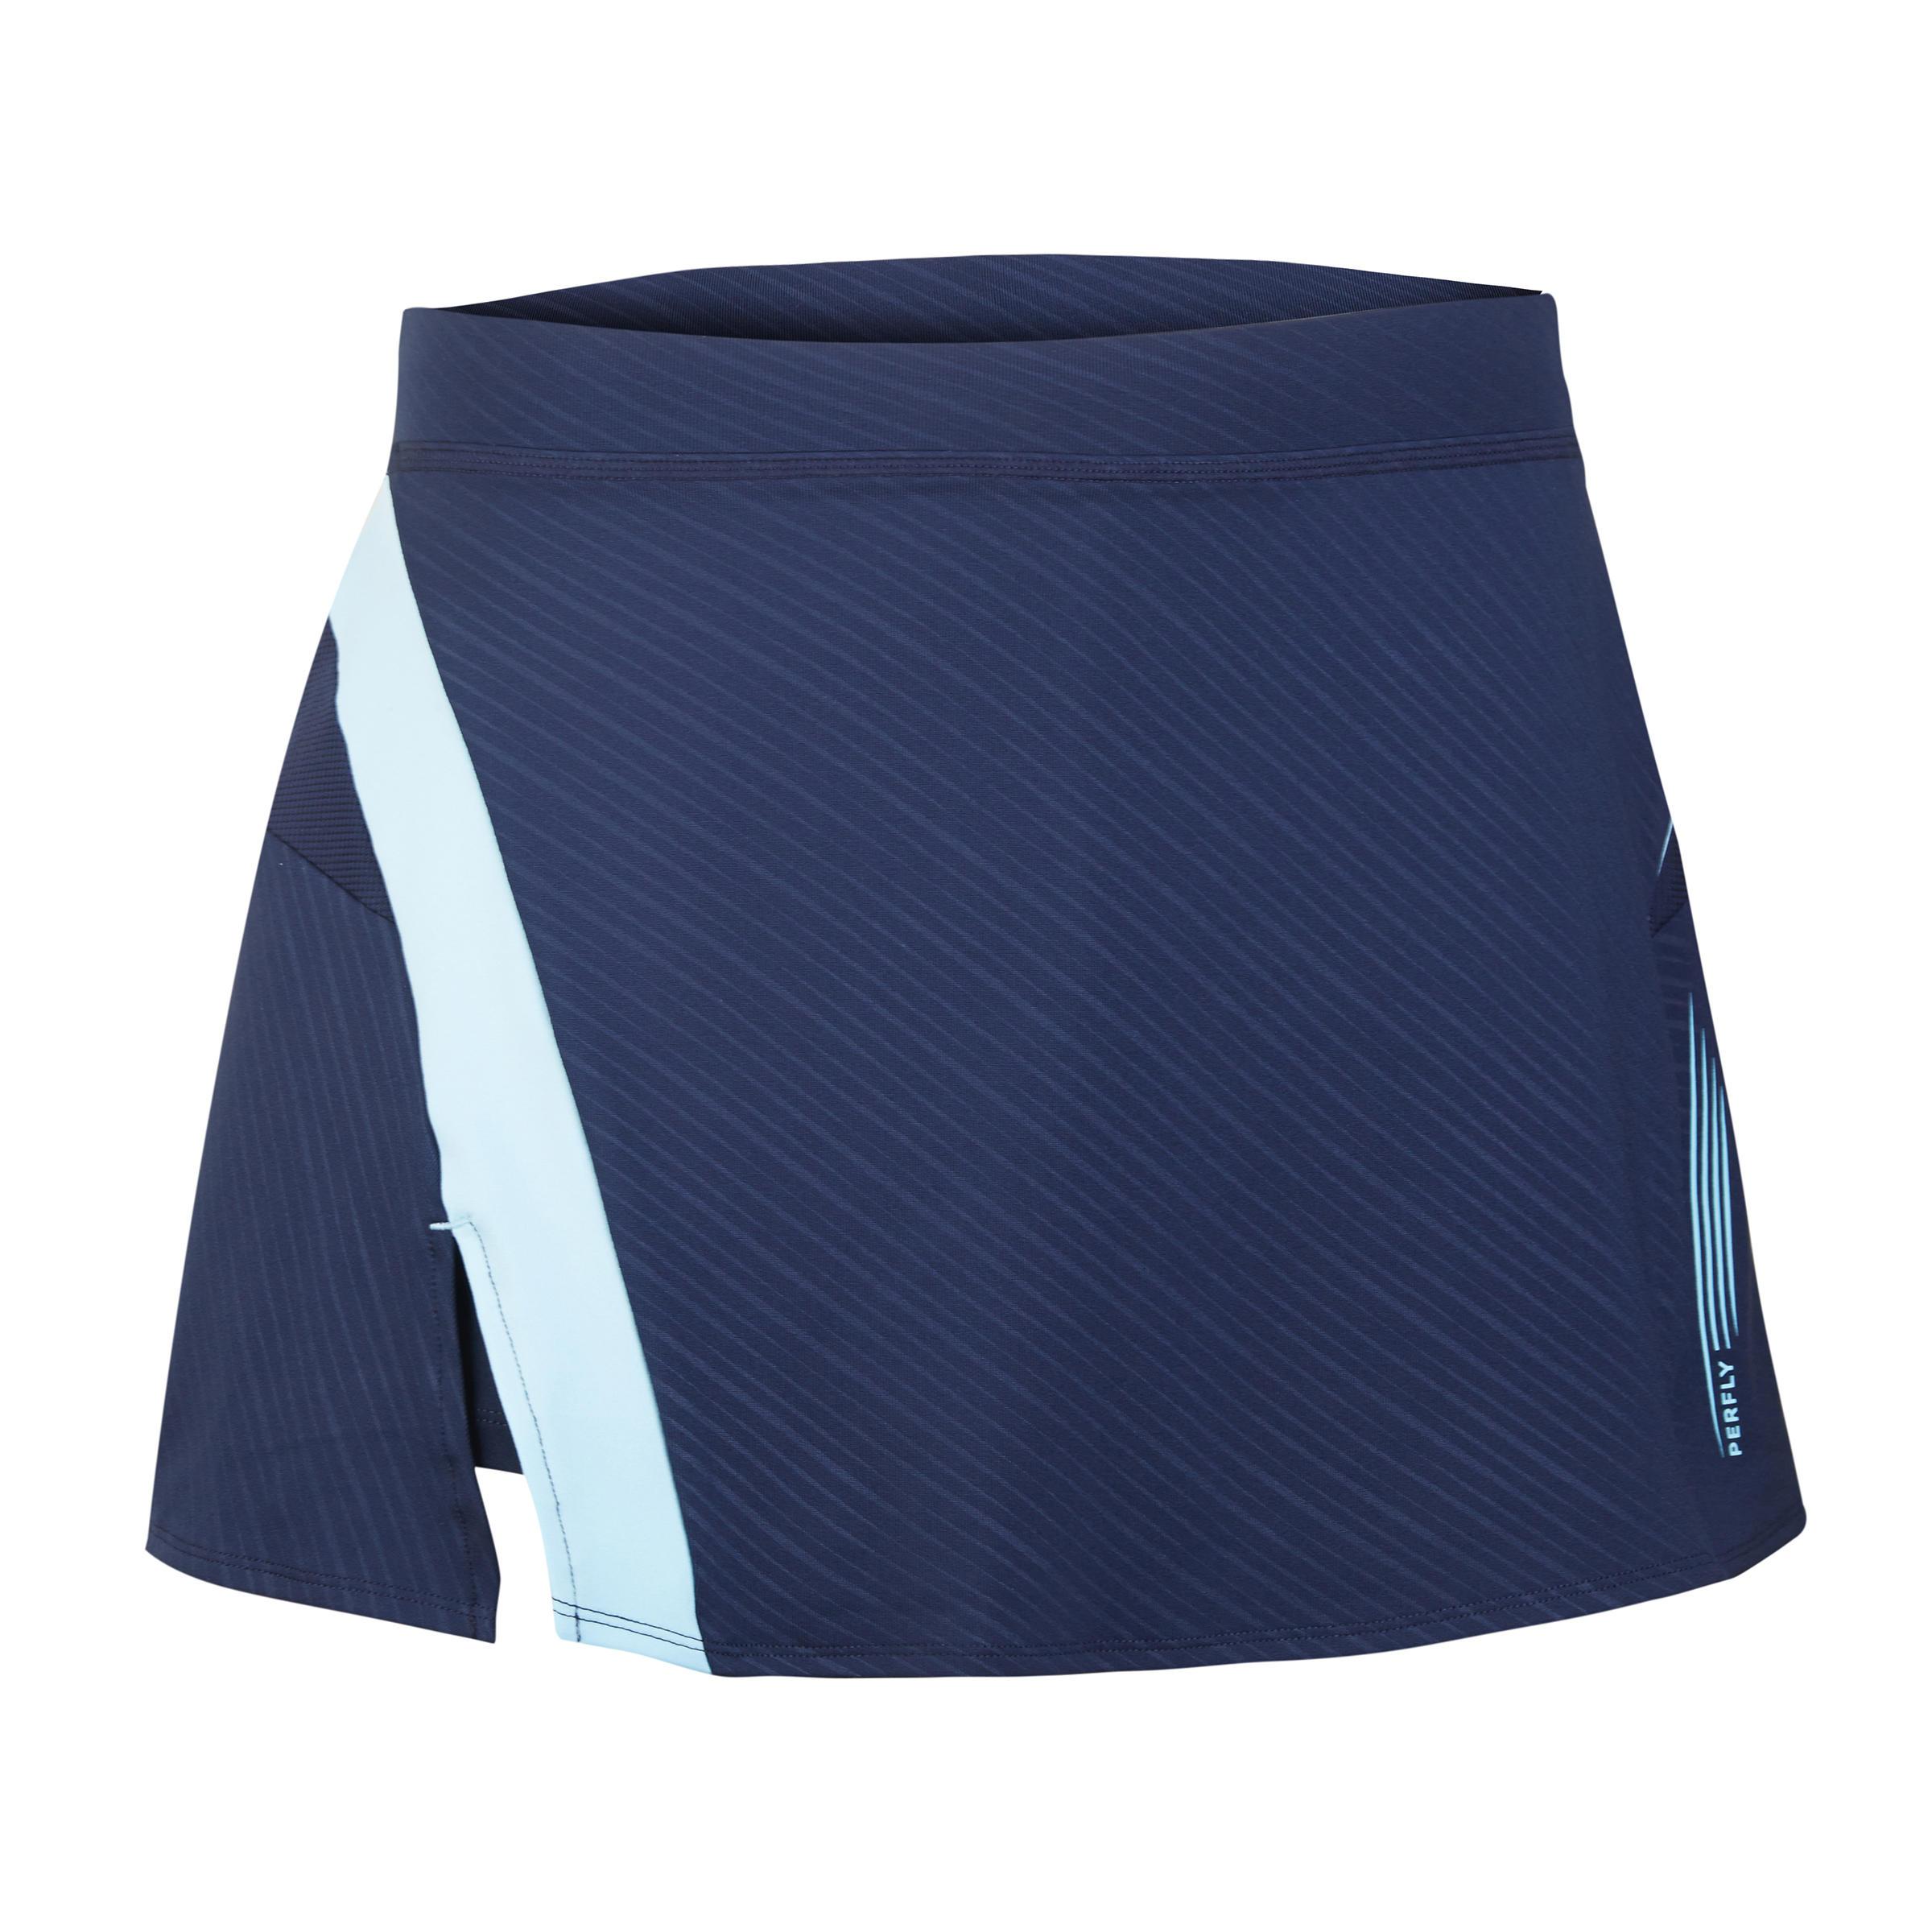 Sportrock 560 Damen marineblau | Bekleidung > Röcke > Sportröcke | Blau | Perfly